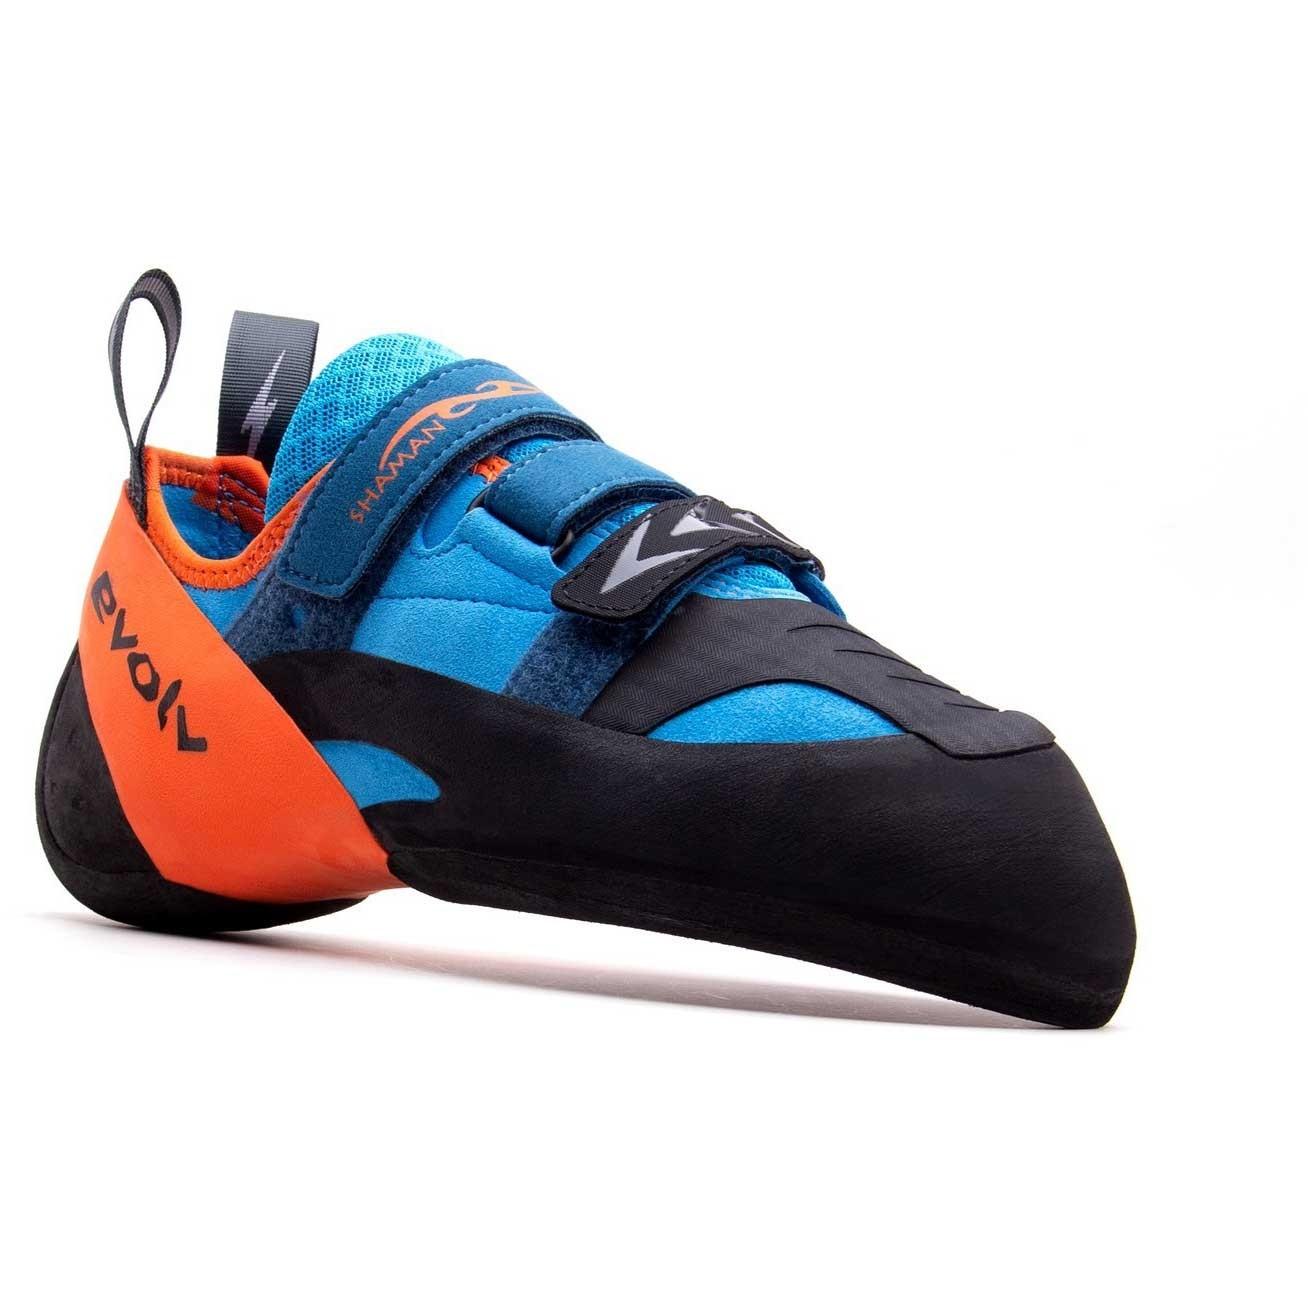 Evolv Shaman Climbing Shoe - Blue/Orange